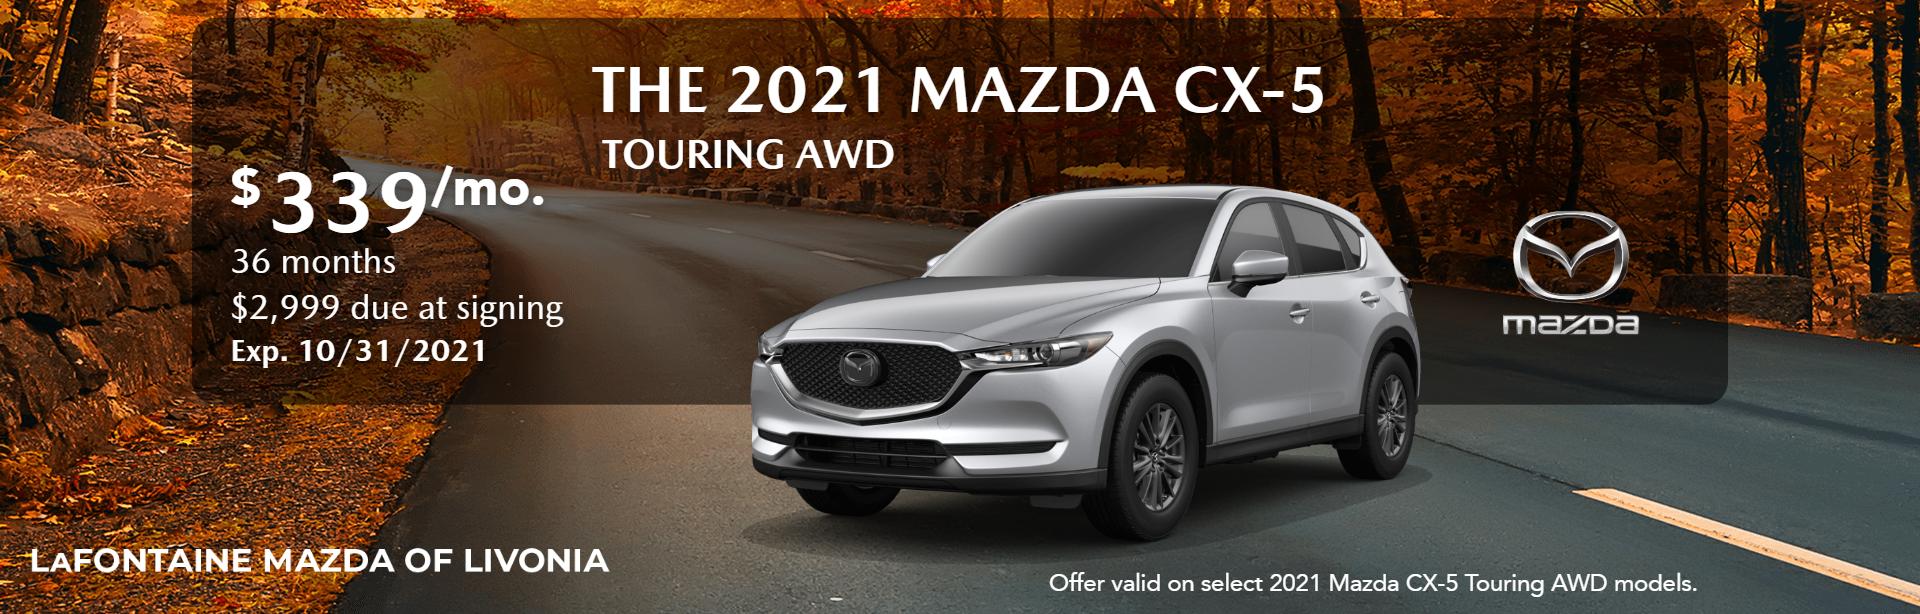 2021_Mazda_CX-5_Touring AWD_Web site Banner